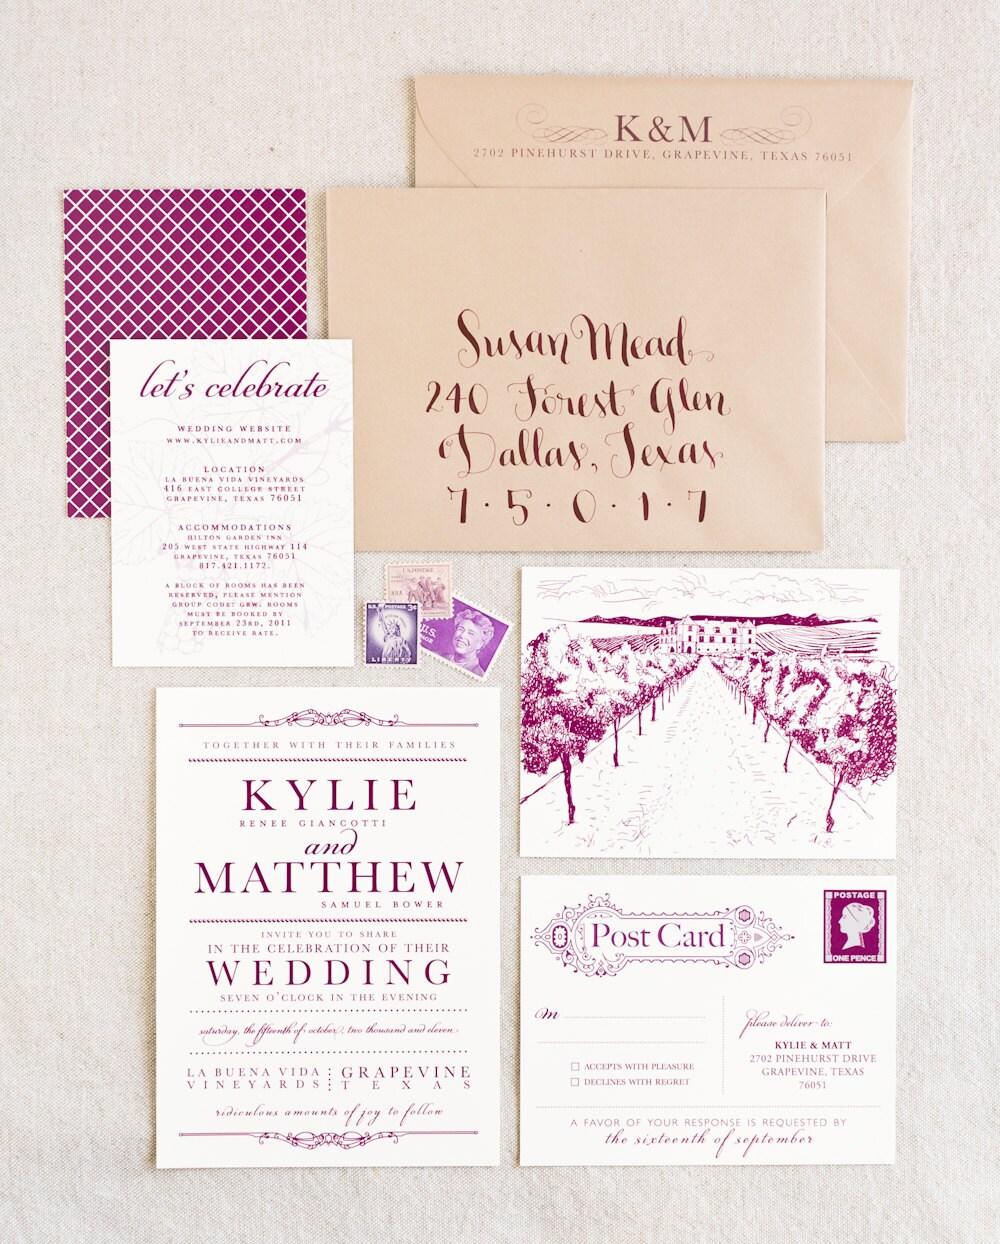 vineyard wedding invitations. special vineyard wedding invitations, Wedding invitations